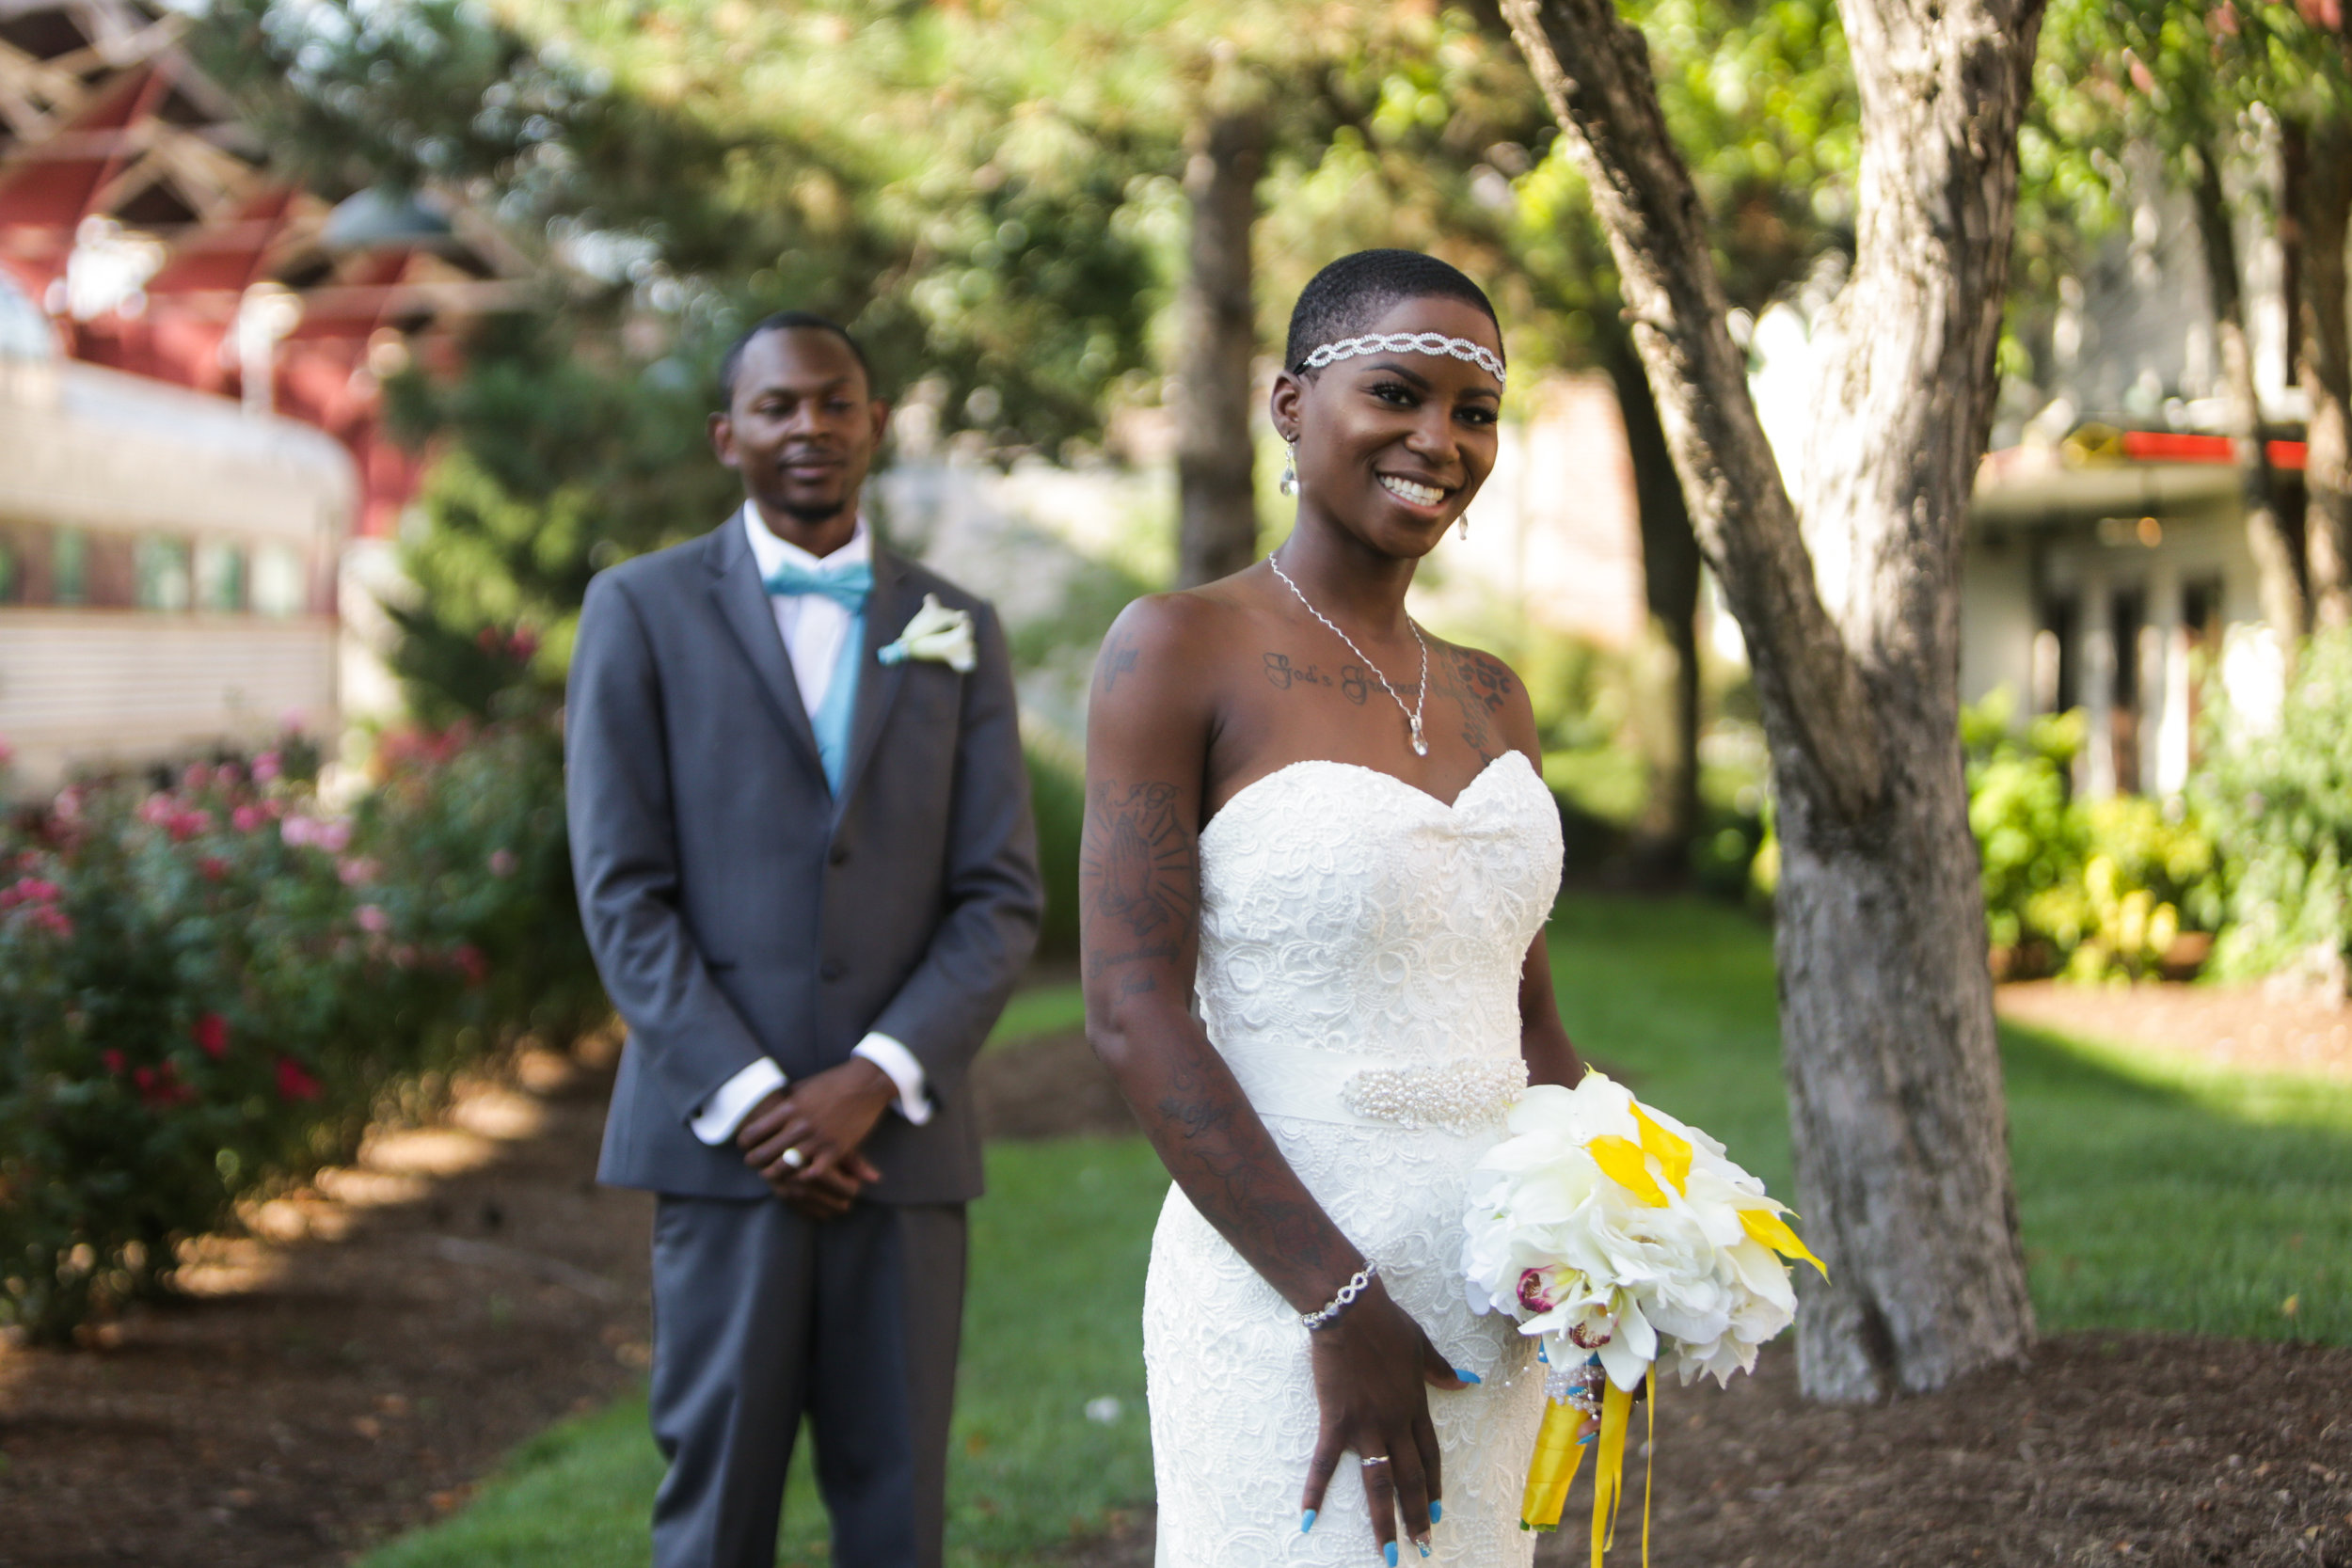 St. Louis Photographer St. Charles Photographer Engagement Wedding Photographer (32).jpg